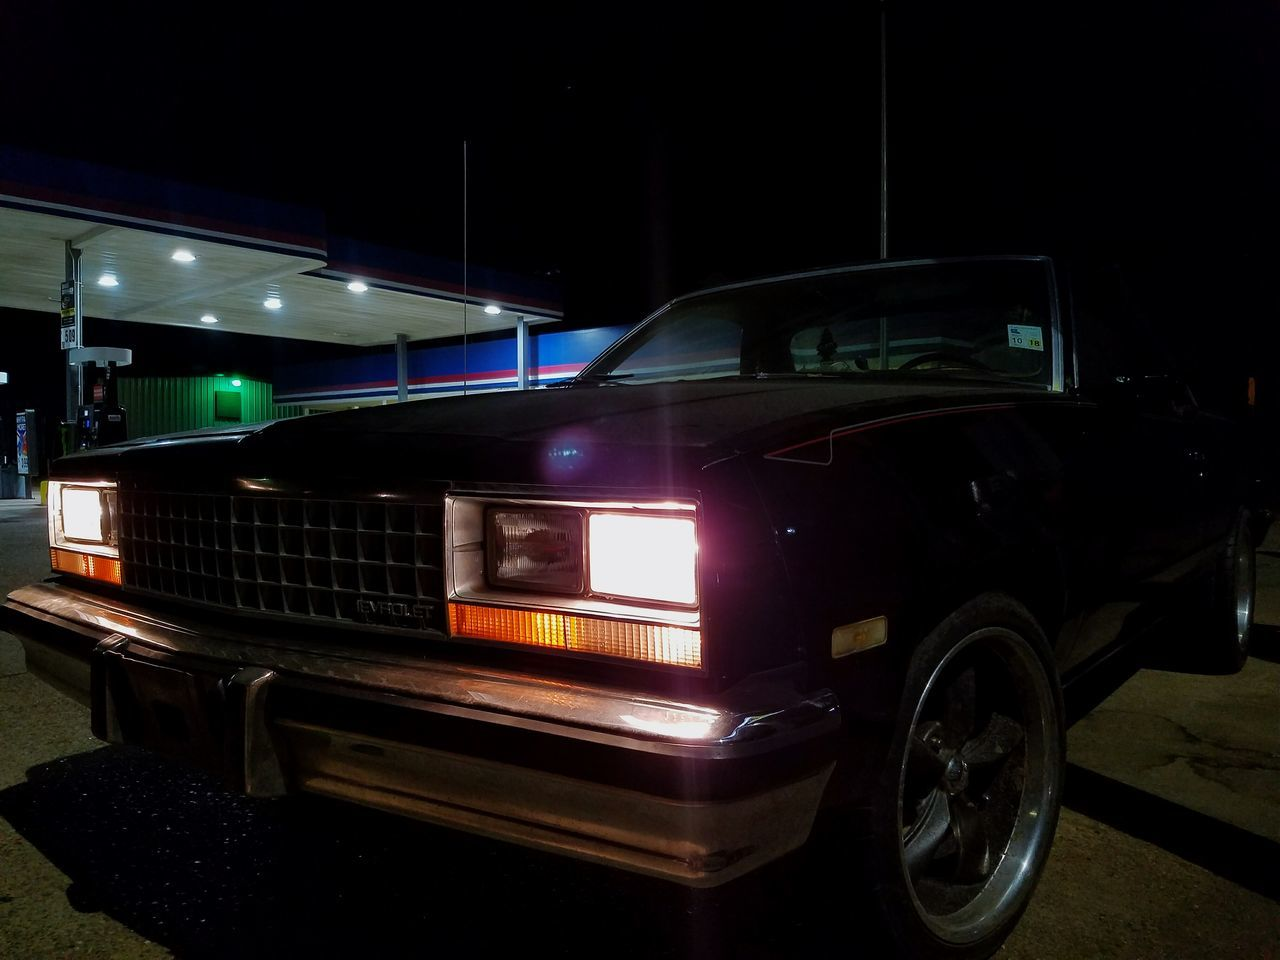 Night Car Illuminated Transportation No People Parking Garage Indoors  El Camino Elcamino Cars Old Car Lieblingsteil